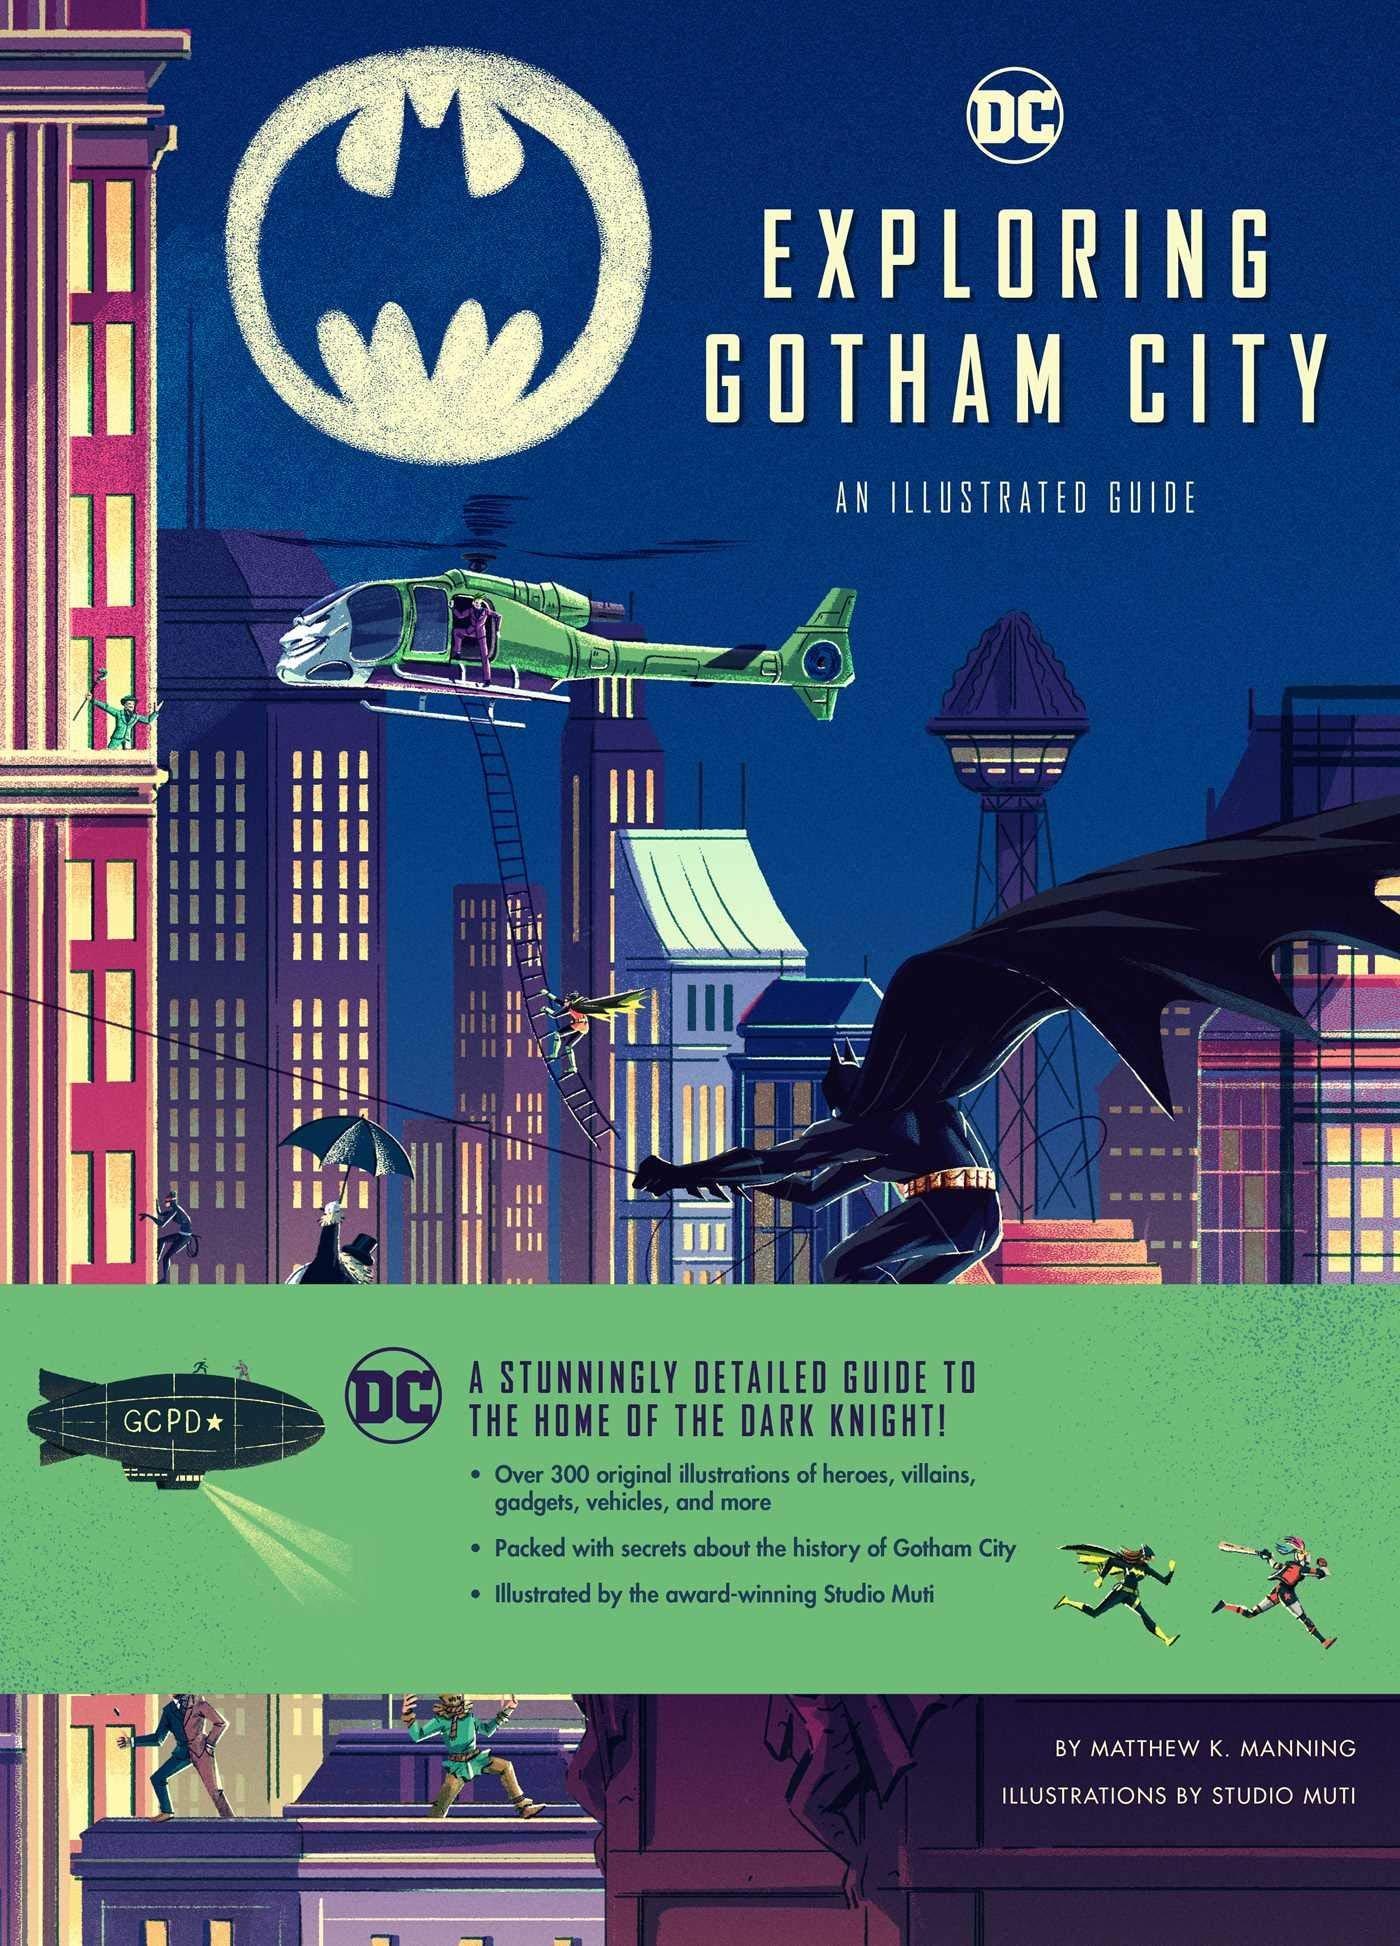 Exploring Gotham City Book Review